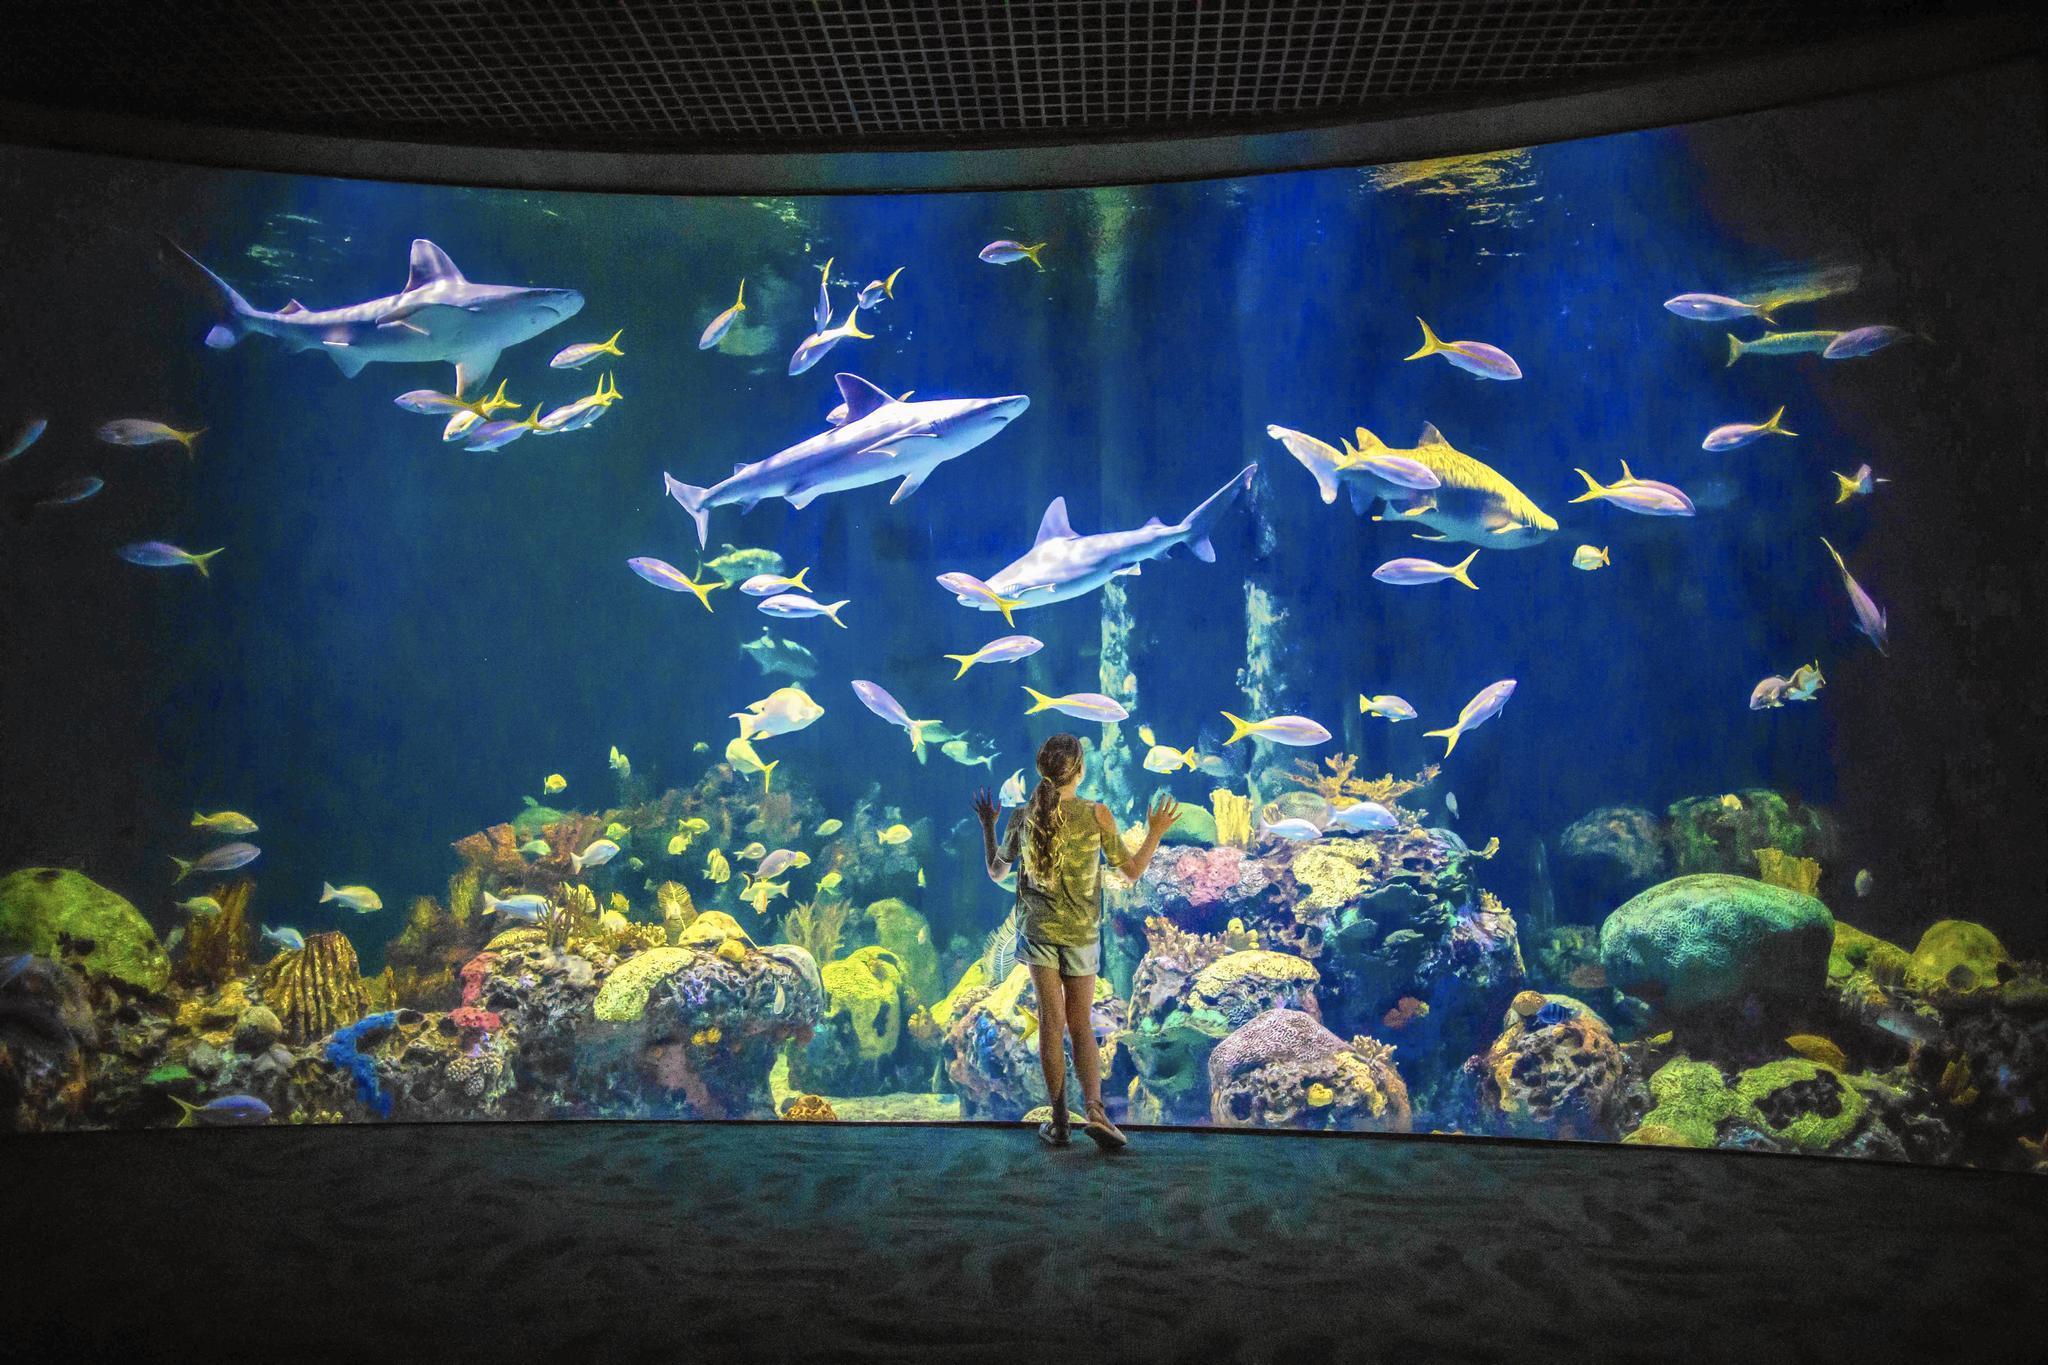 New Wonders of Wildlife aquarium and museum turns conservation knob